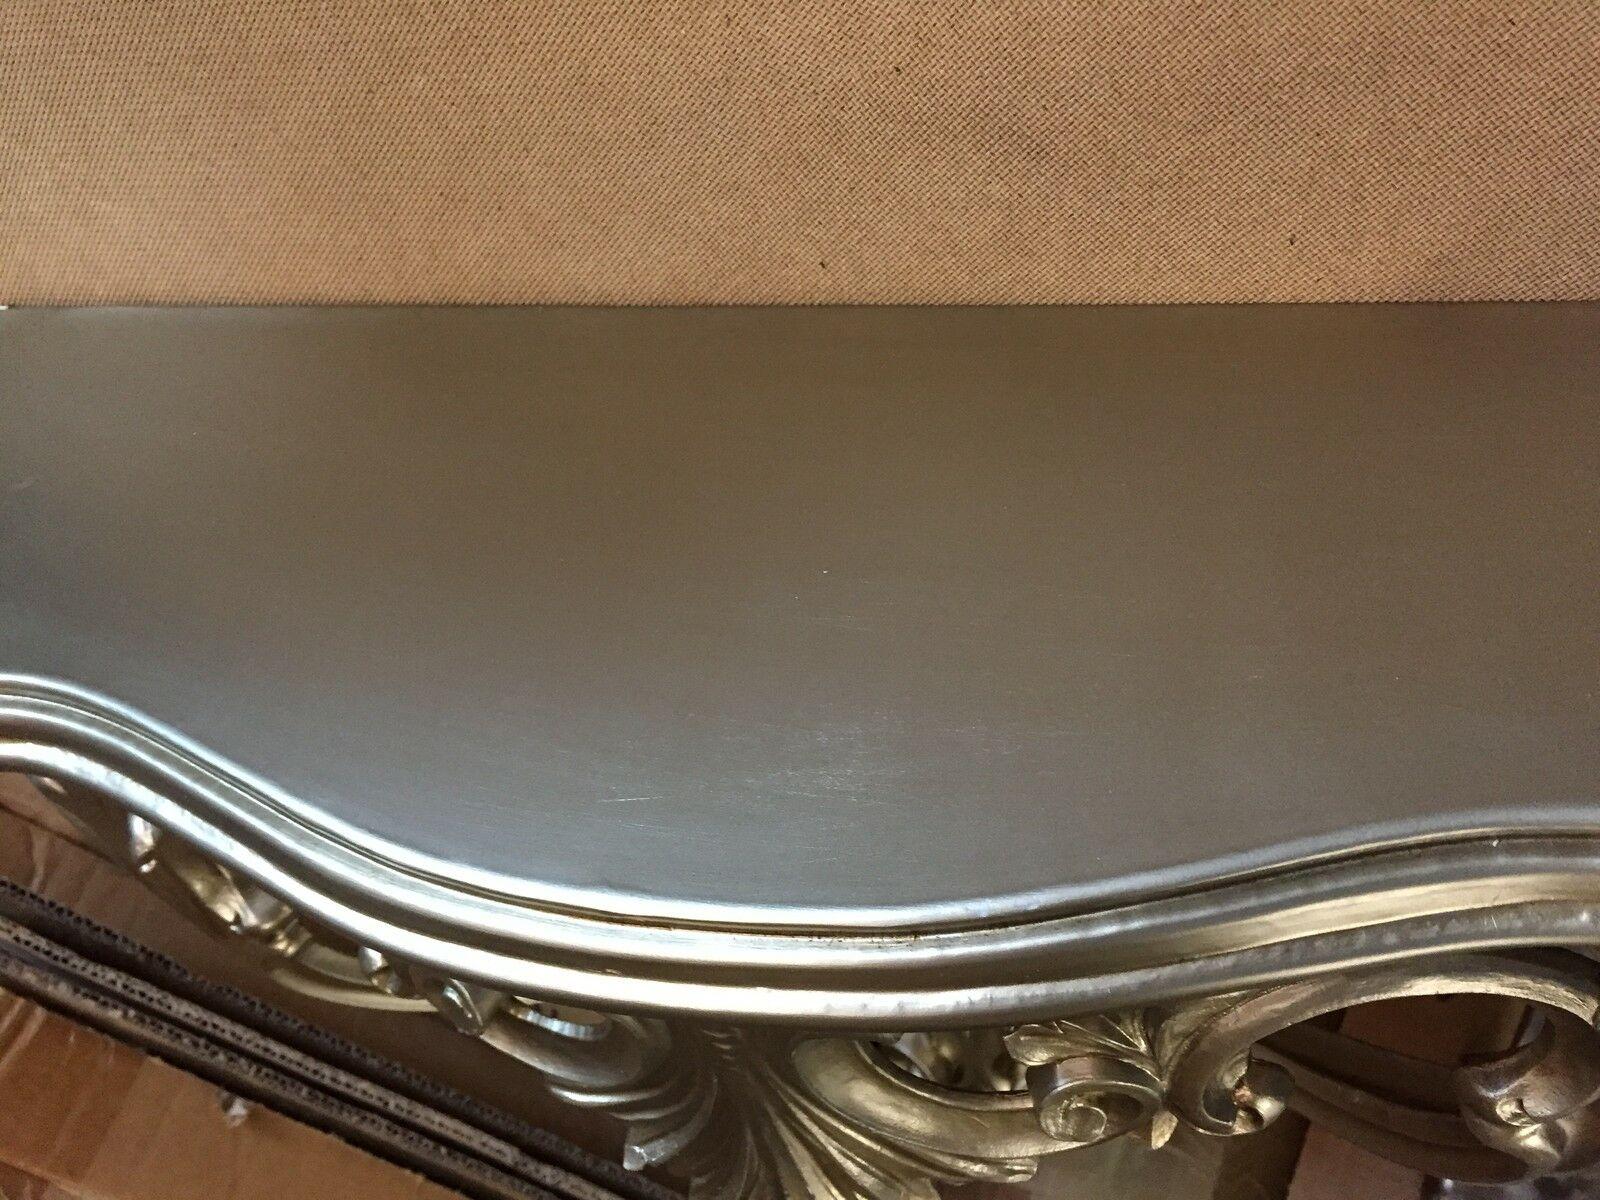 Wandkonsole Antik silber Sonderpreis Konsole 56x45x18 Wandspiegel cp60 Regal